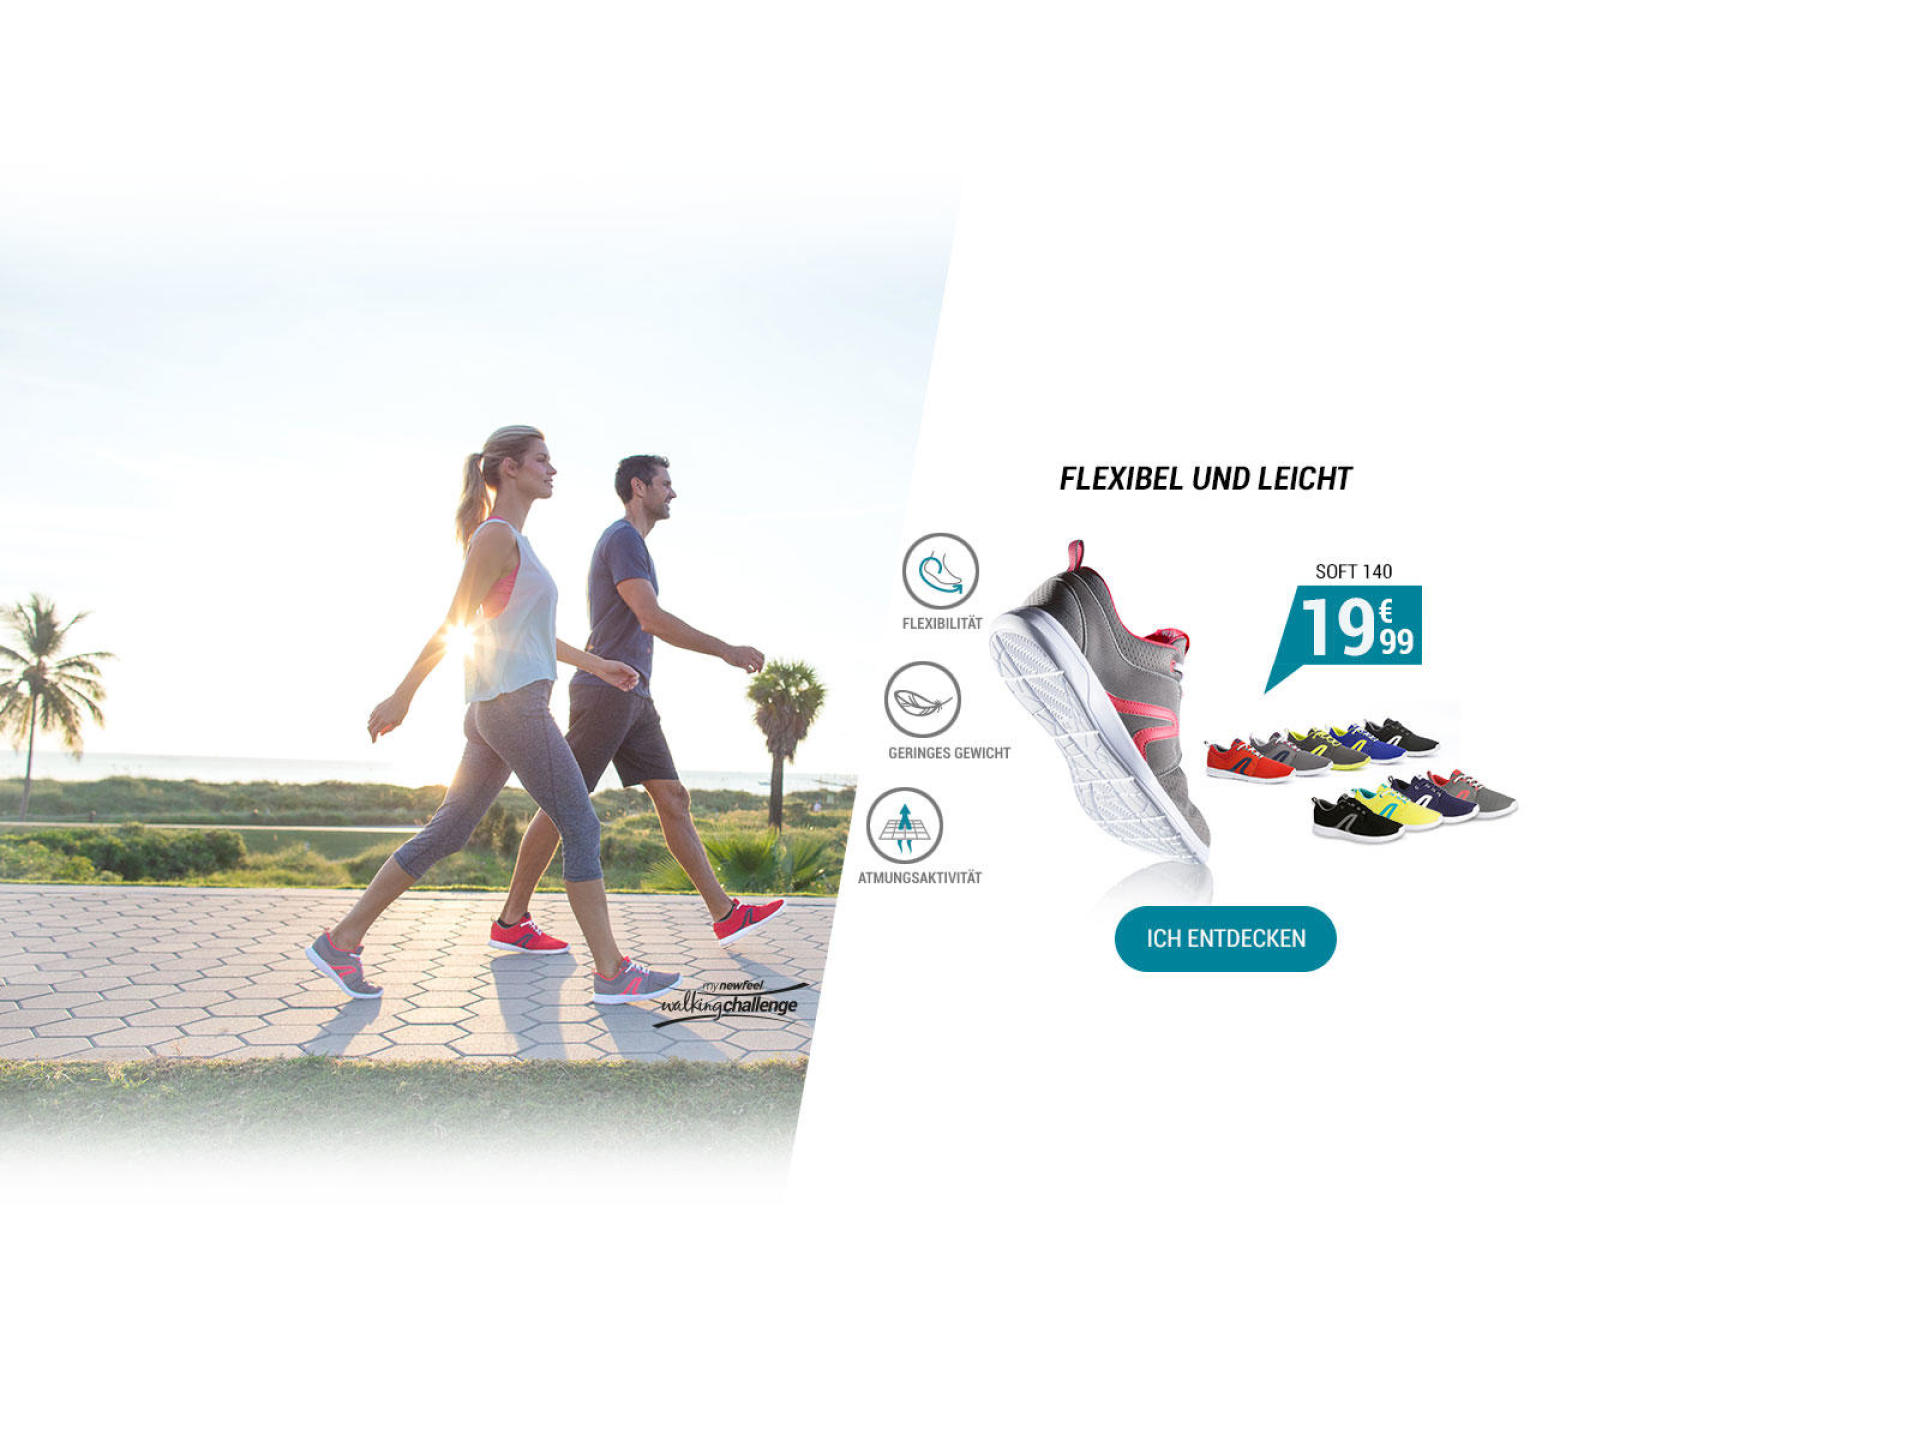 Walkingschuhe Soft 140 - Flexibel und leicht